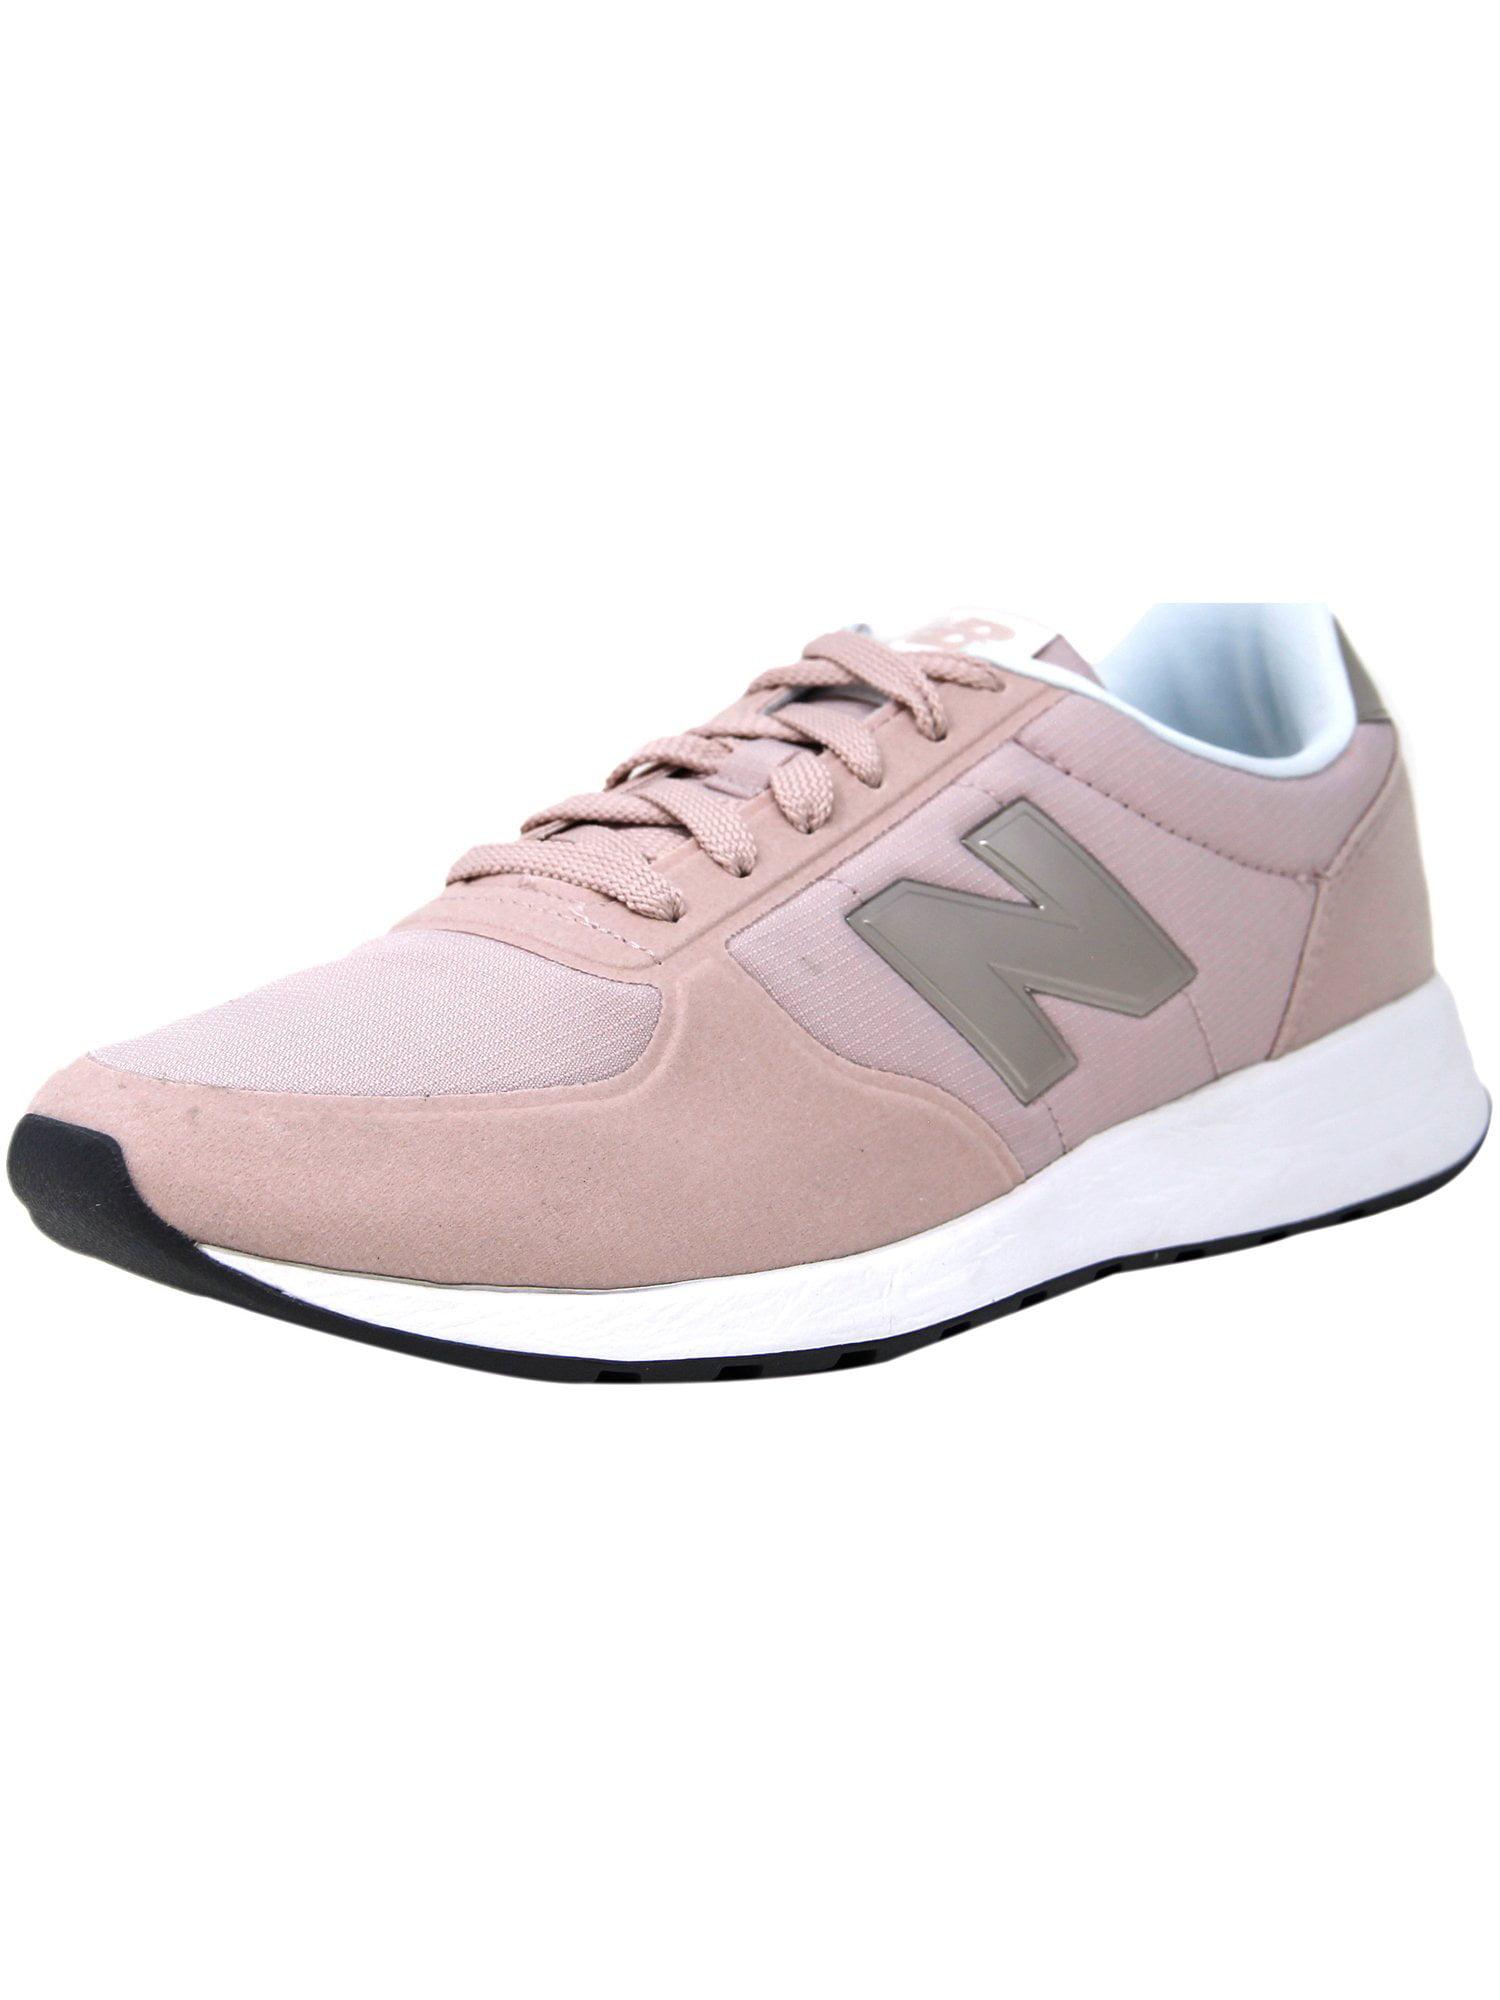 New Balance Women's Ws215 Rc Ankle-High Fashion Sneaker - 9.5M